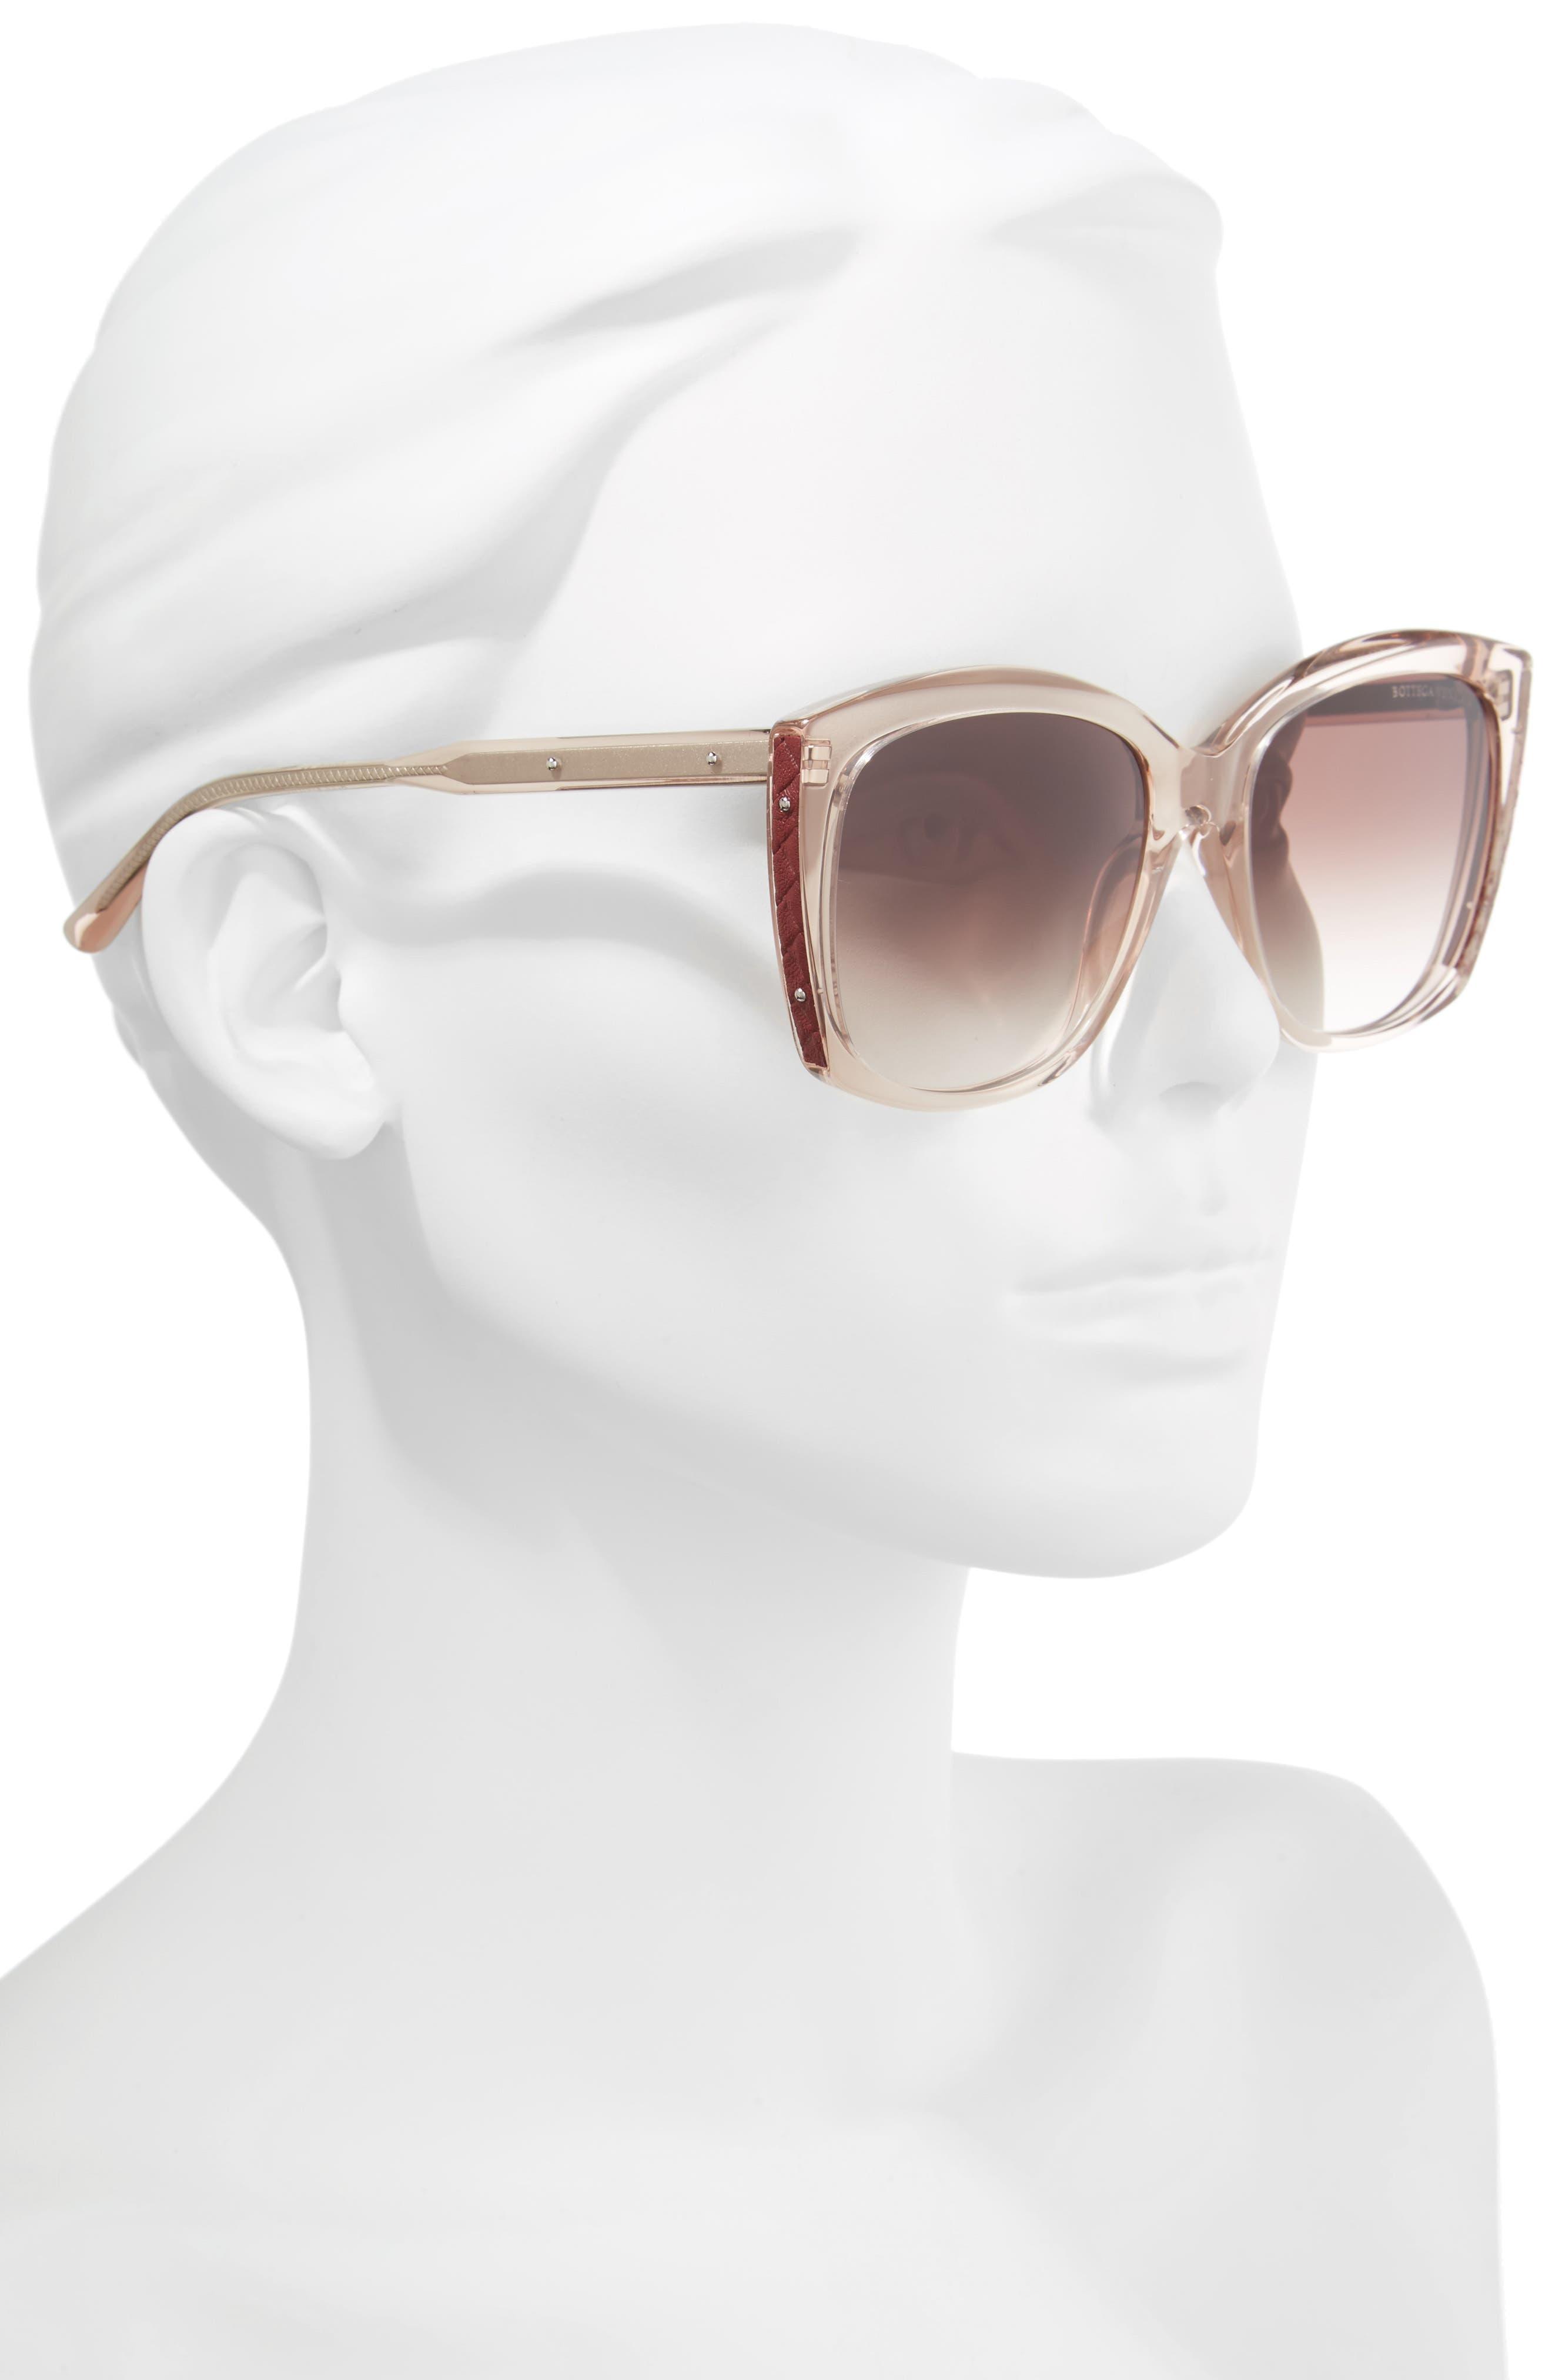 55mm Cat Eye Sunglasses,                             Alternate thumbnail 2, color,                             Pink